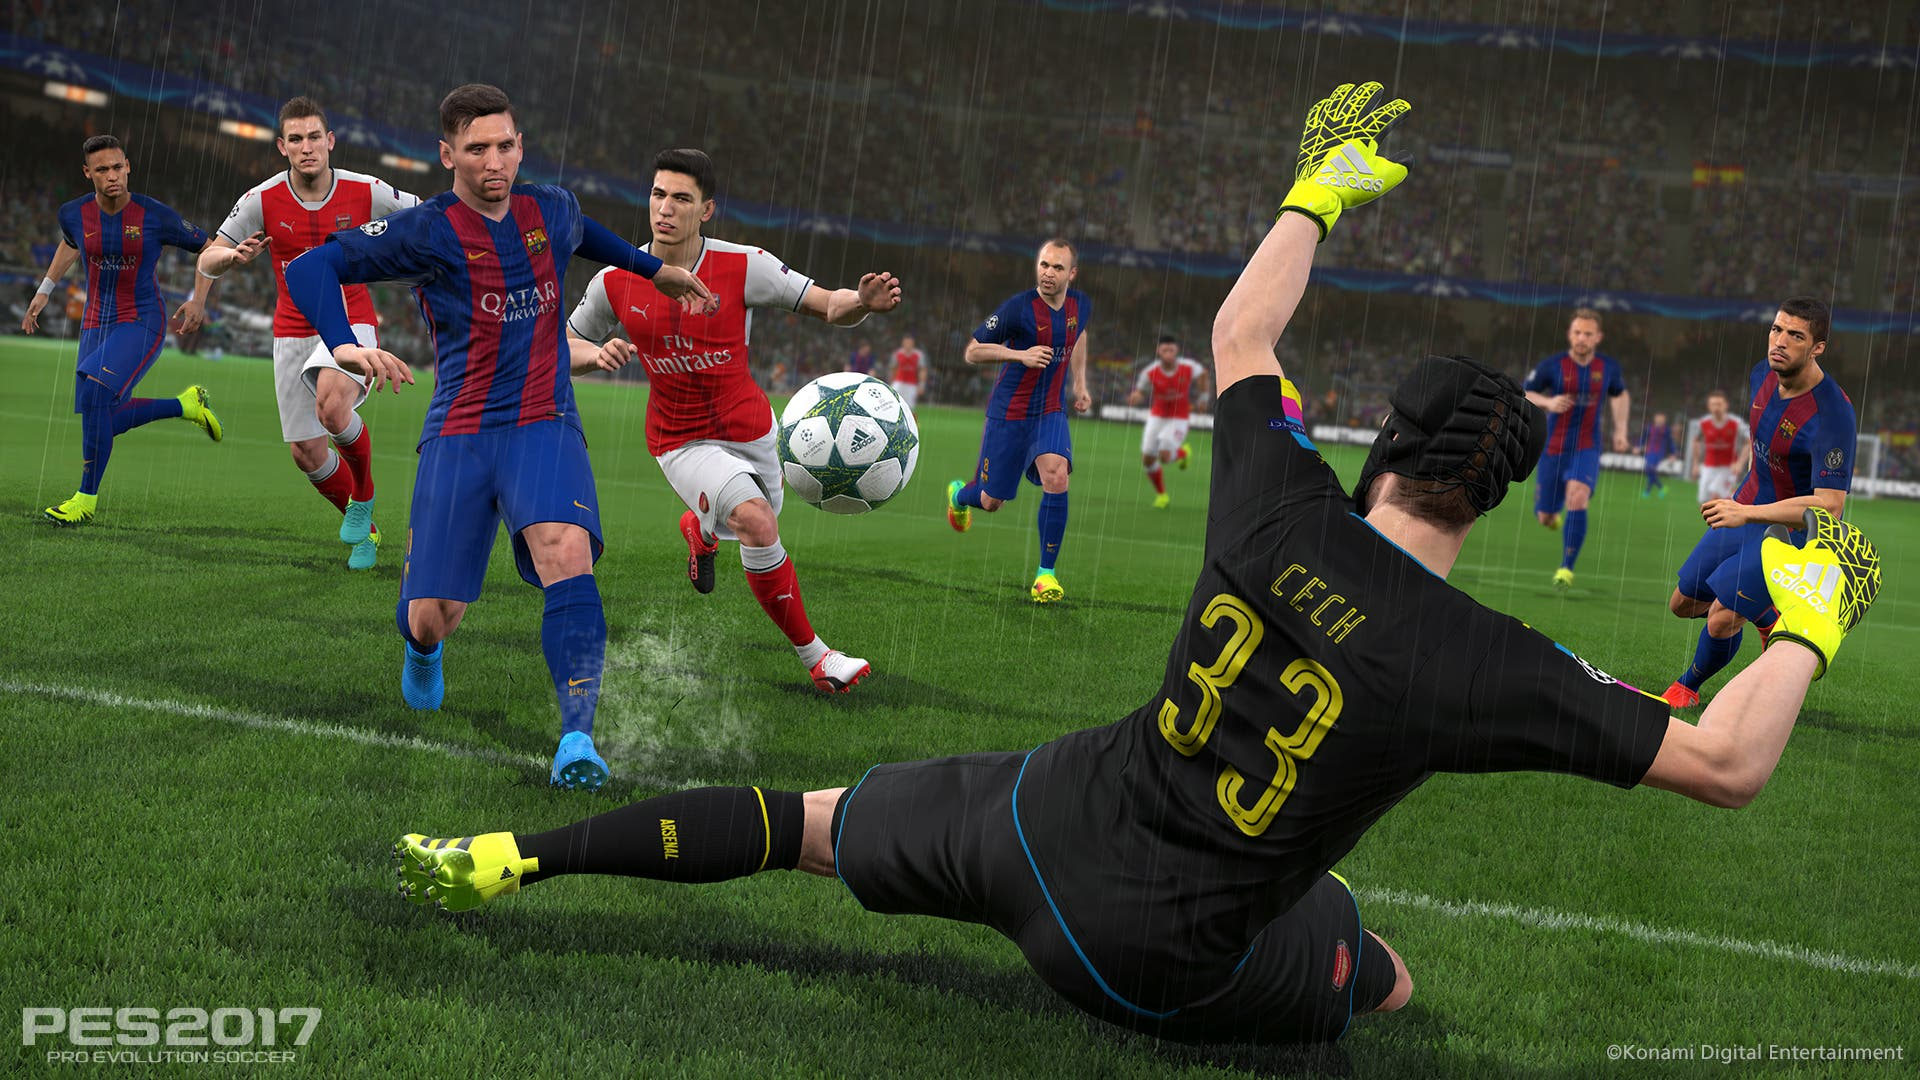 Imagen de Análisis Pro Evolution Soccer 2017